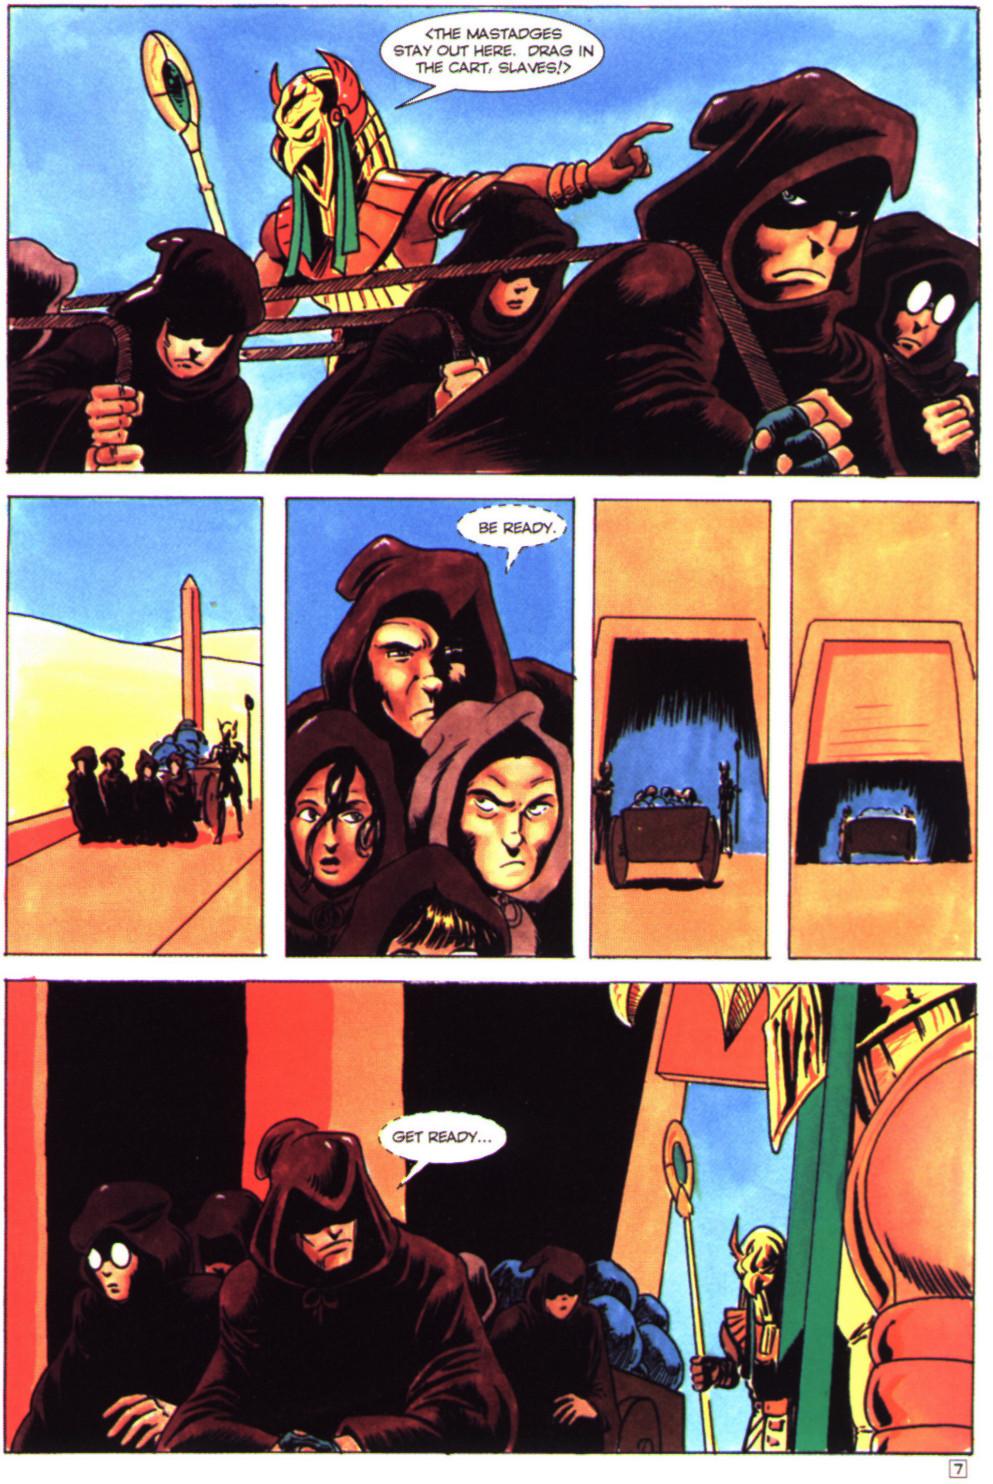 Read online Stargate comic -  Issue #4 - 9